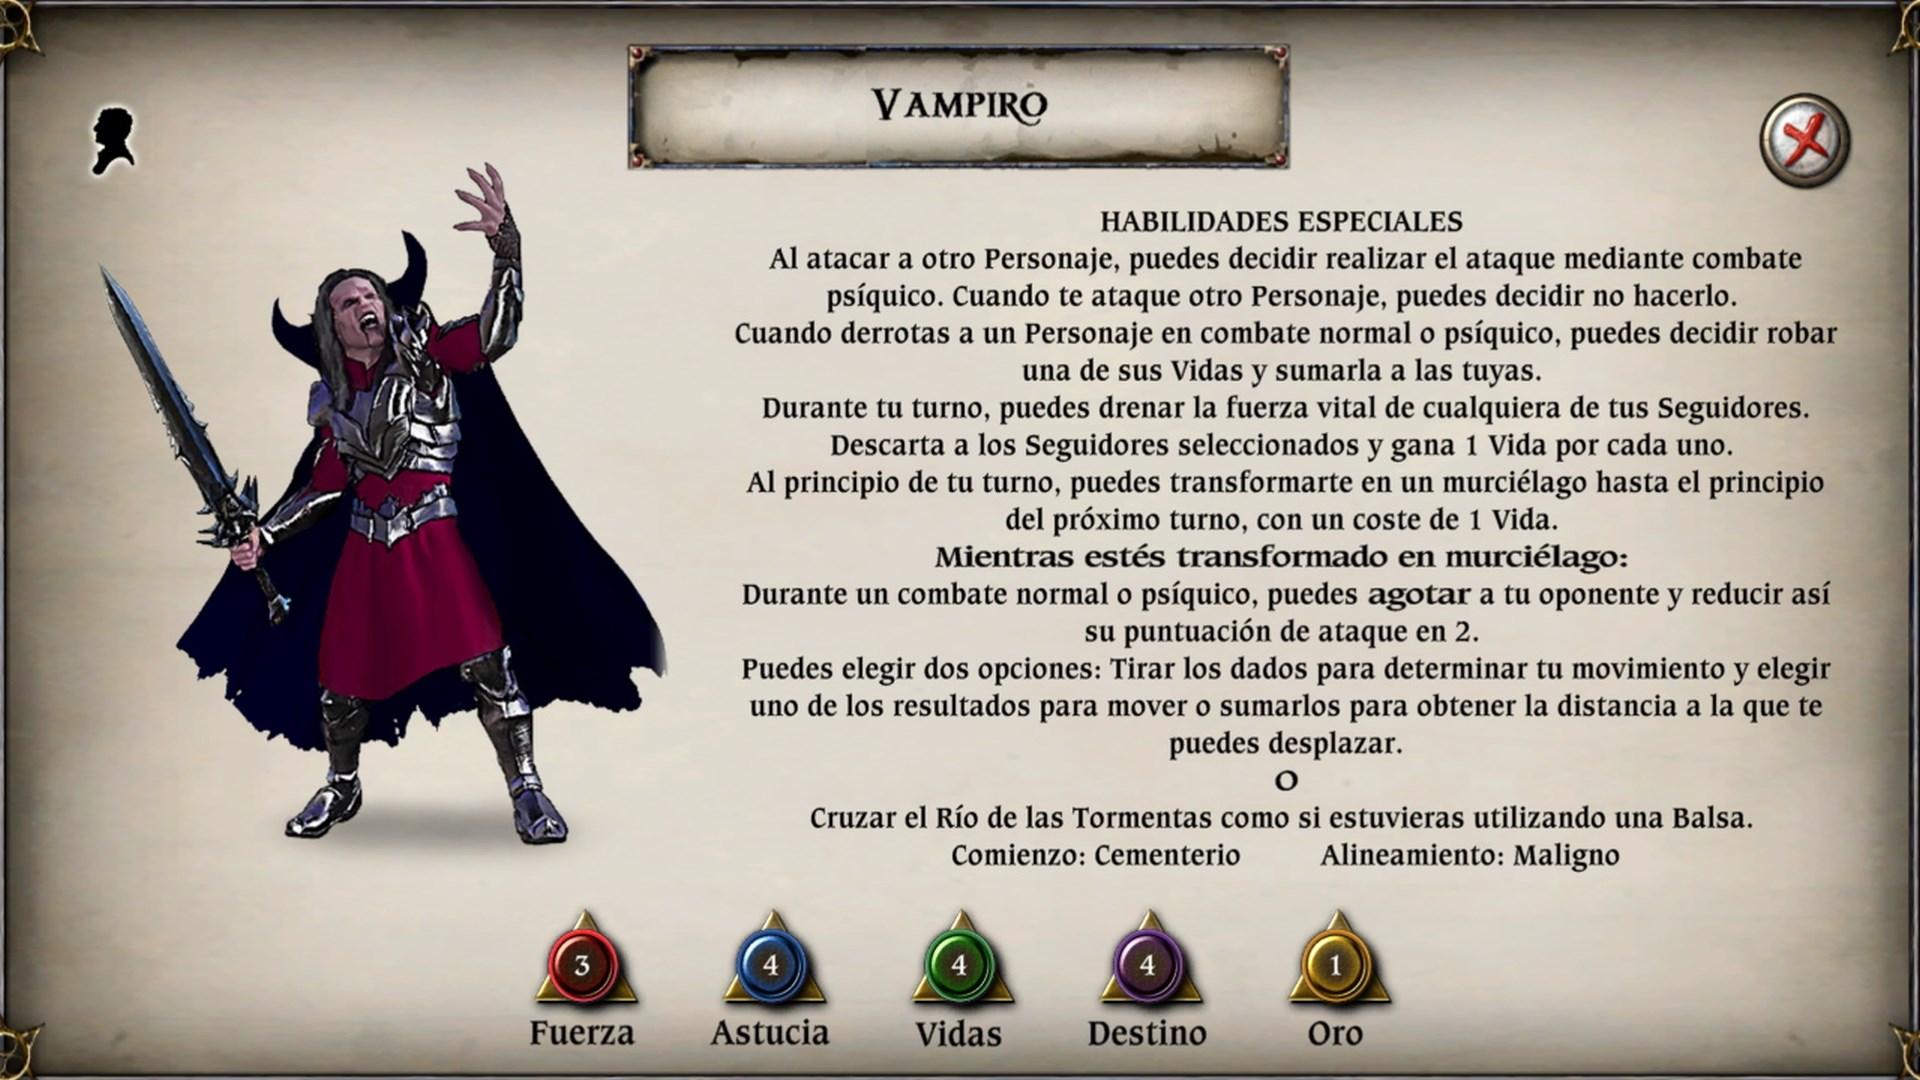 Talisman: Digital Edition - The Vampire Character Pack